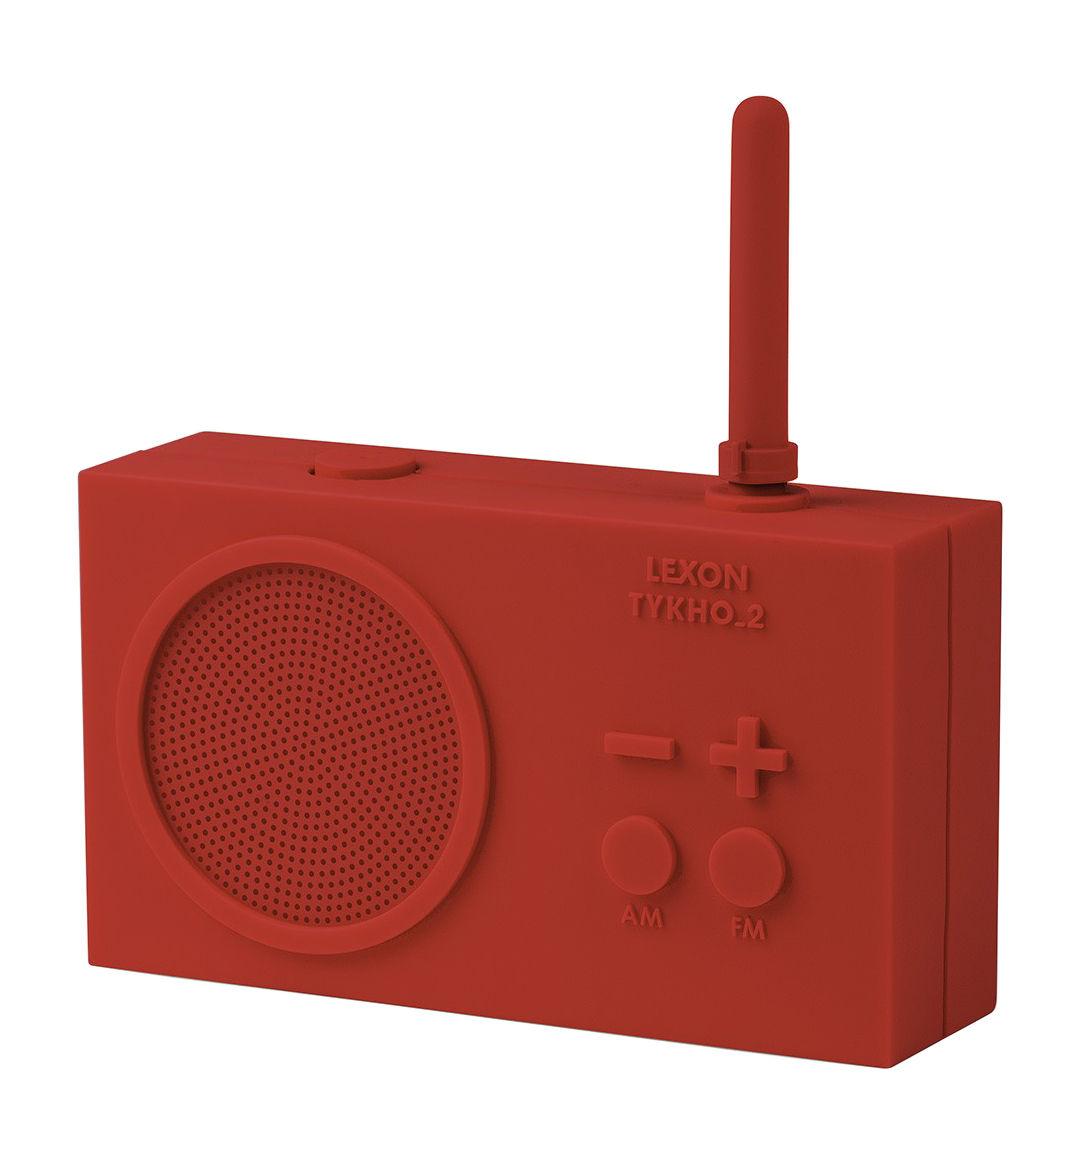 radio sans fil tykho 2 rechargeable usb rouge lexon made in design. Black Bedroom Furniture Sets. Home Design Ideas